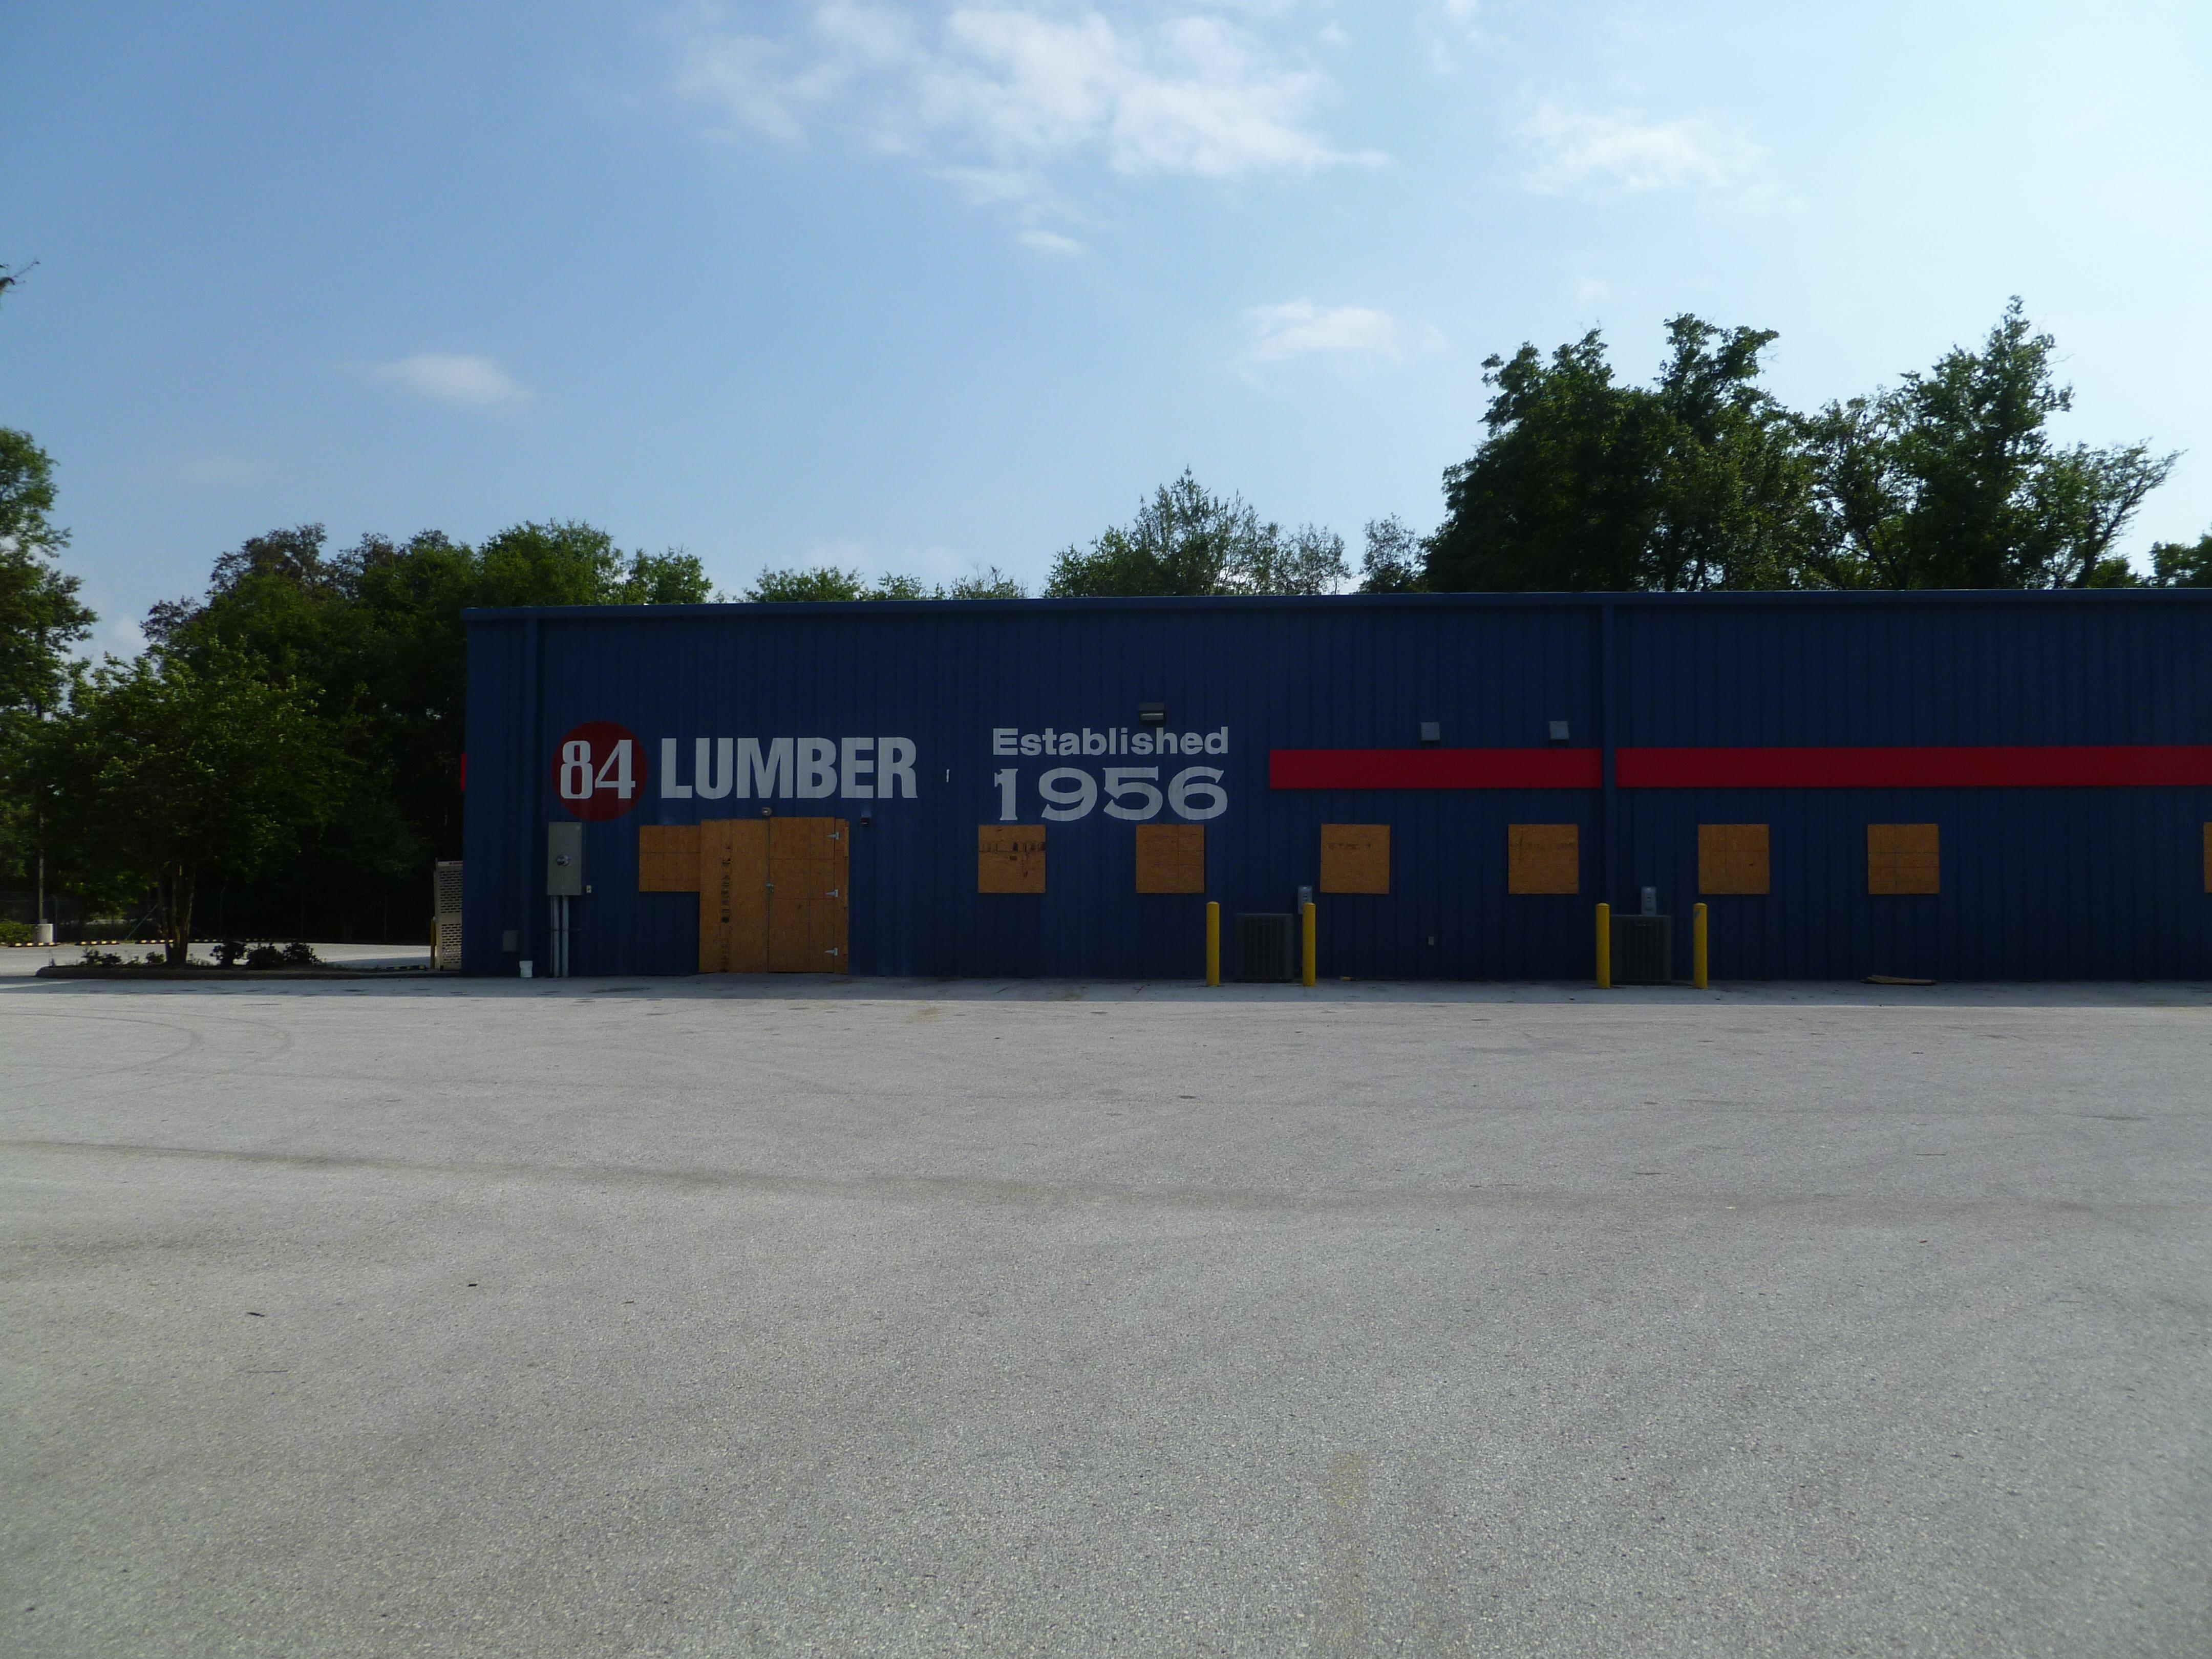 File84 Lumber Since 1954